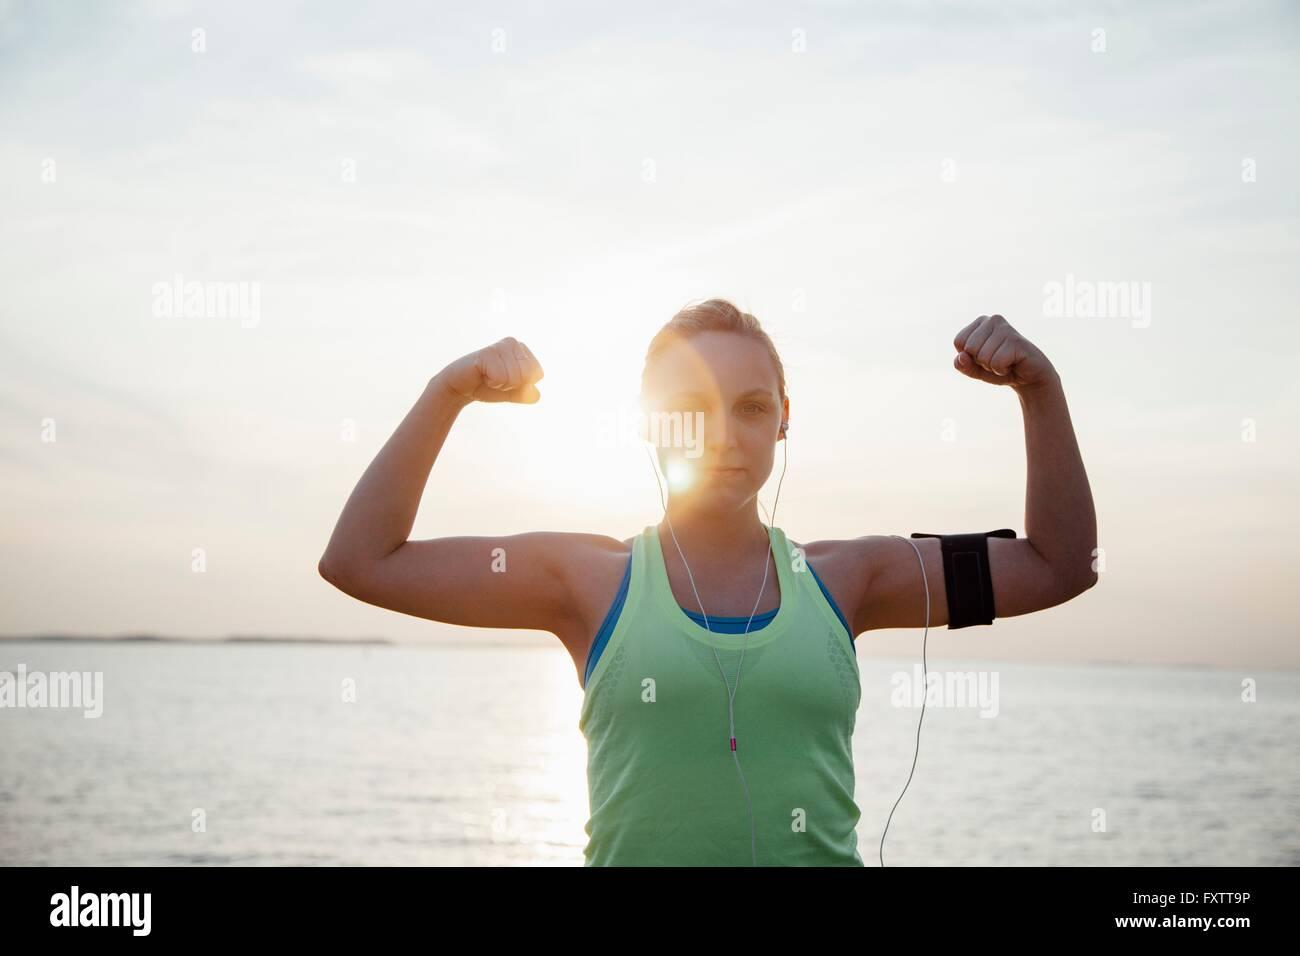 Frau trägt Aktivitätstracker, hob die Arme biegen Muskeln Blick in die Kamera Stockbild